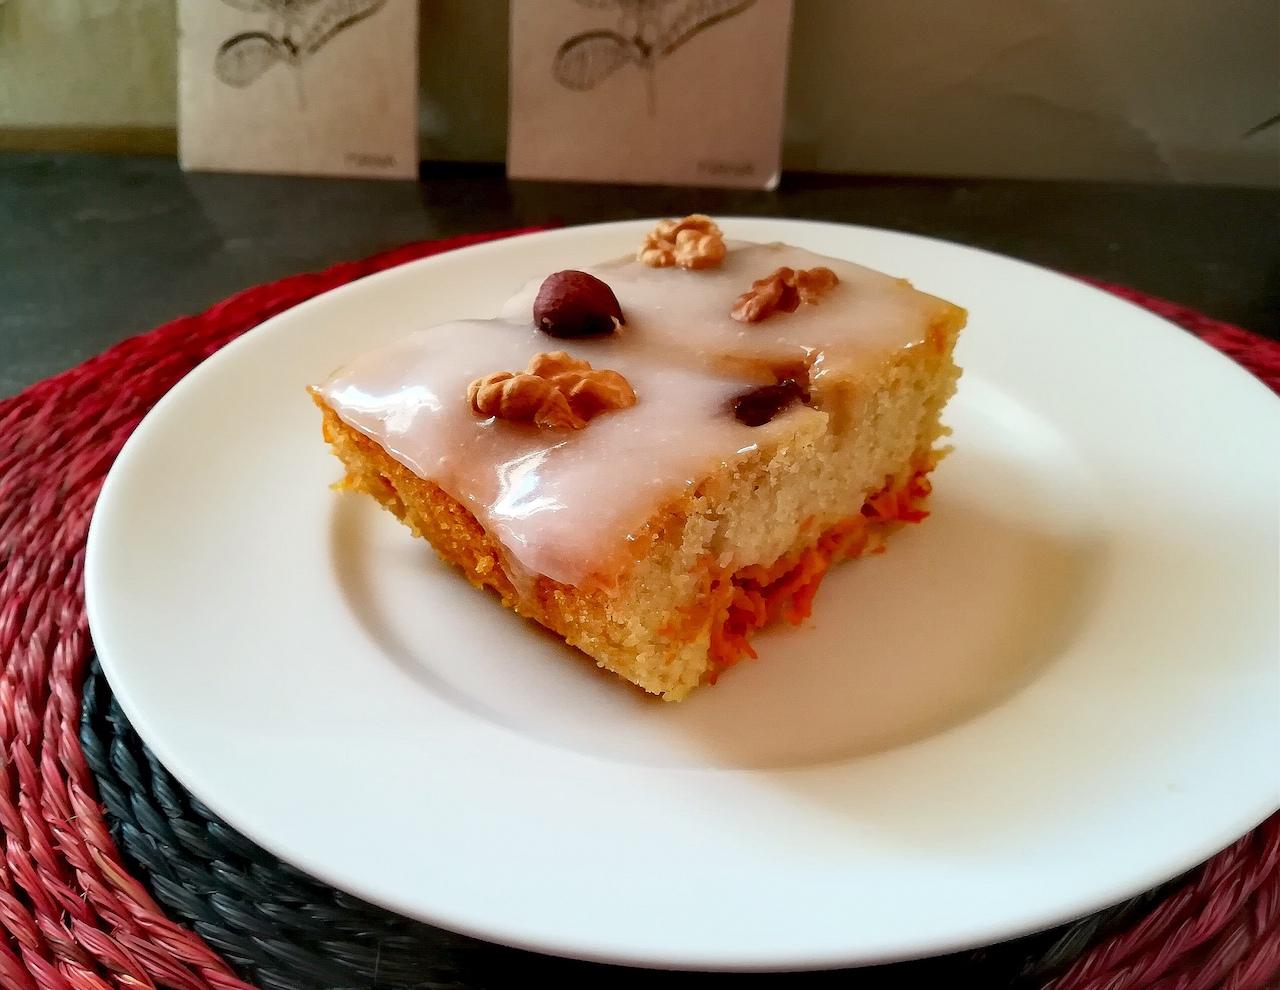 Recette du carrot cake (gâteau à la carotte)